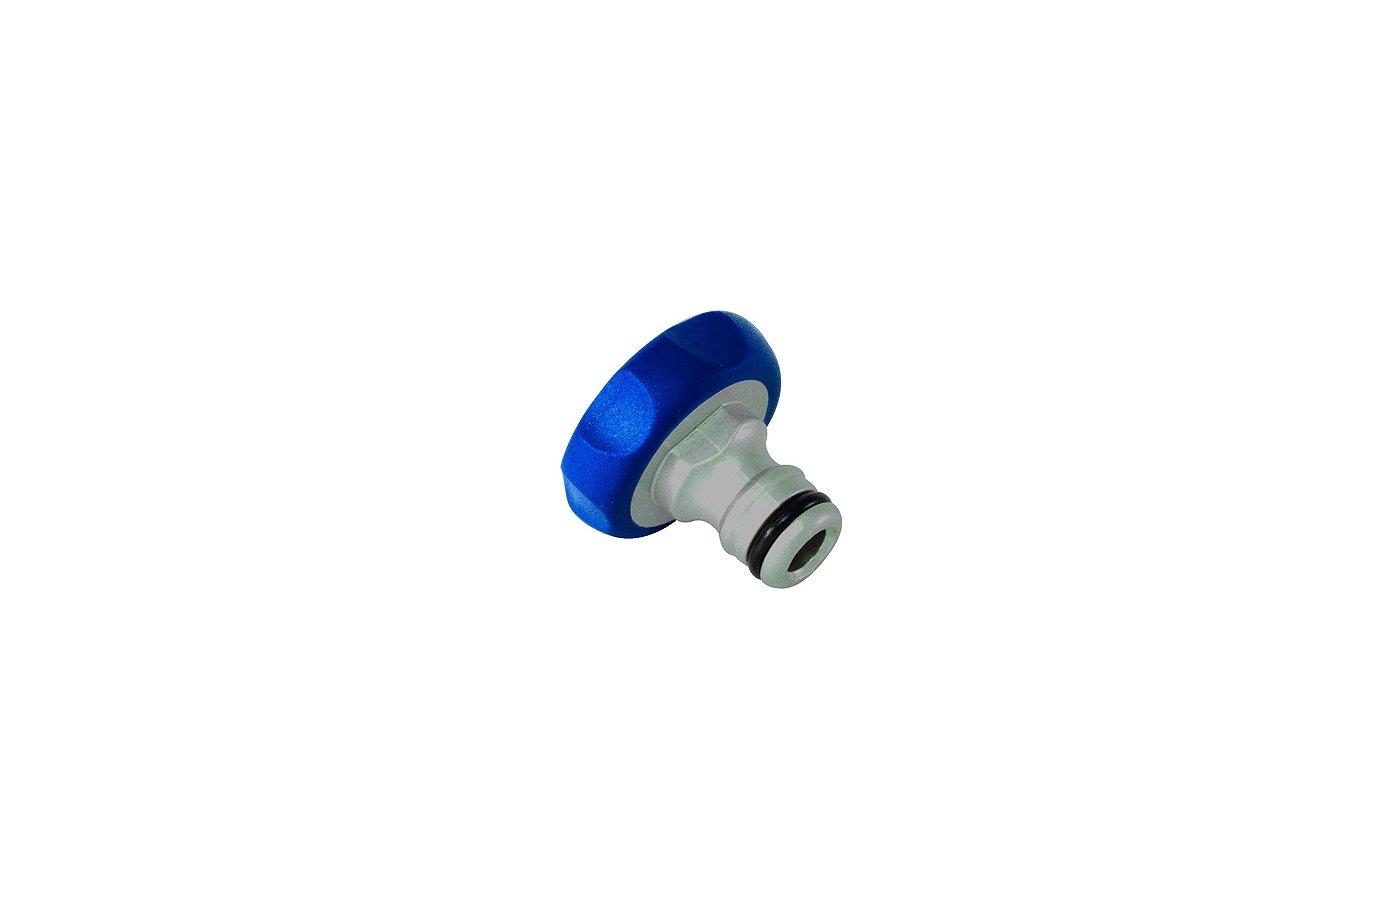 Соединитель GREEN APPLE GWTA20-053 Штуцер резьбовой 19мм (3/4) внутренняя резьба, алюминий